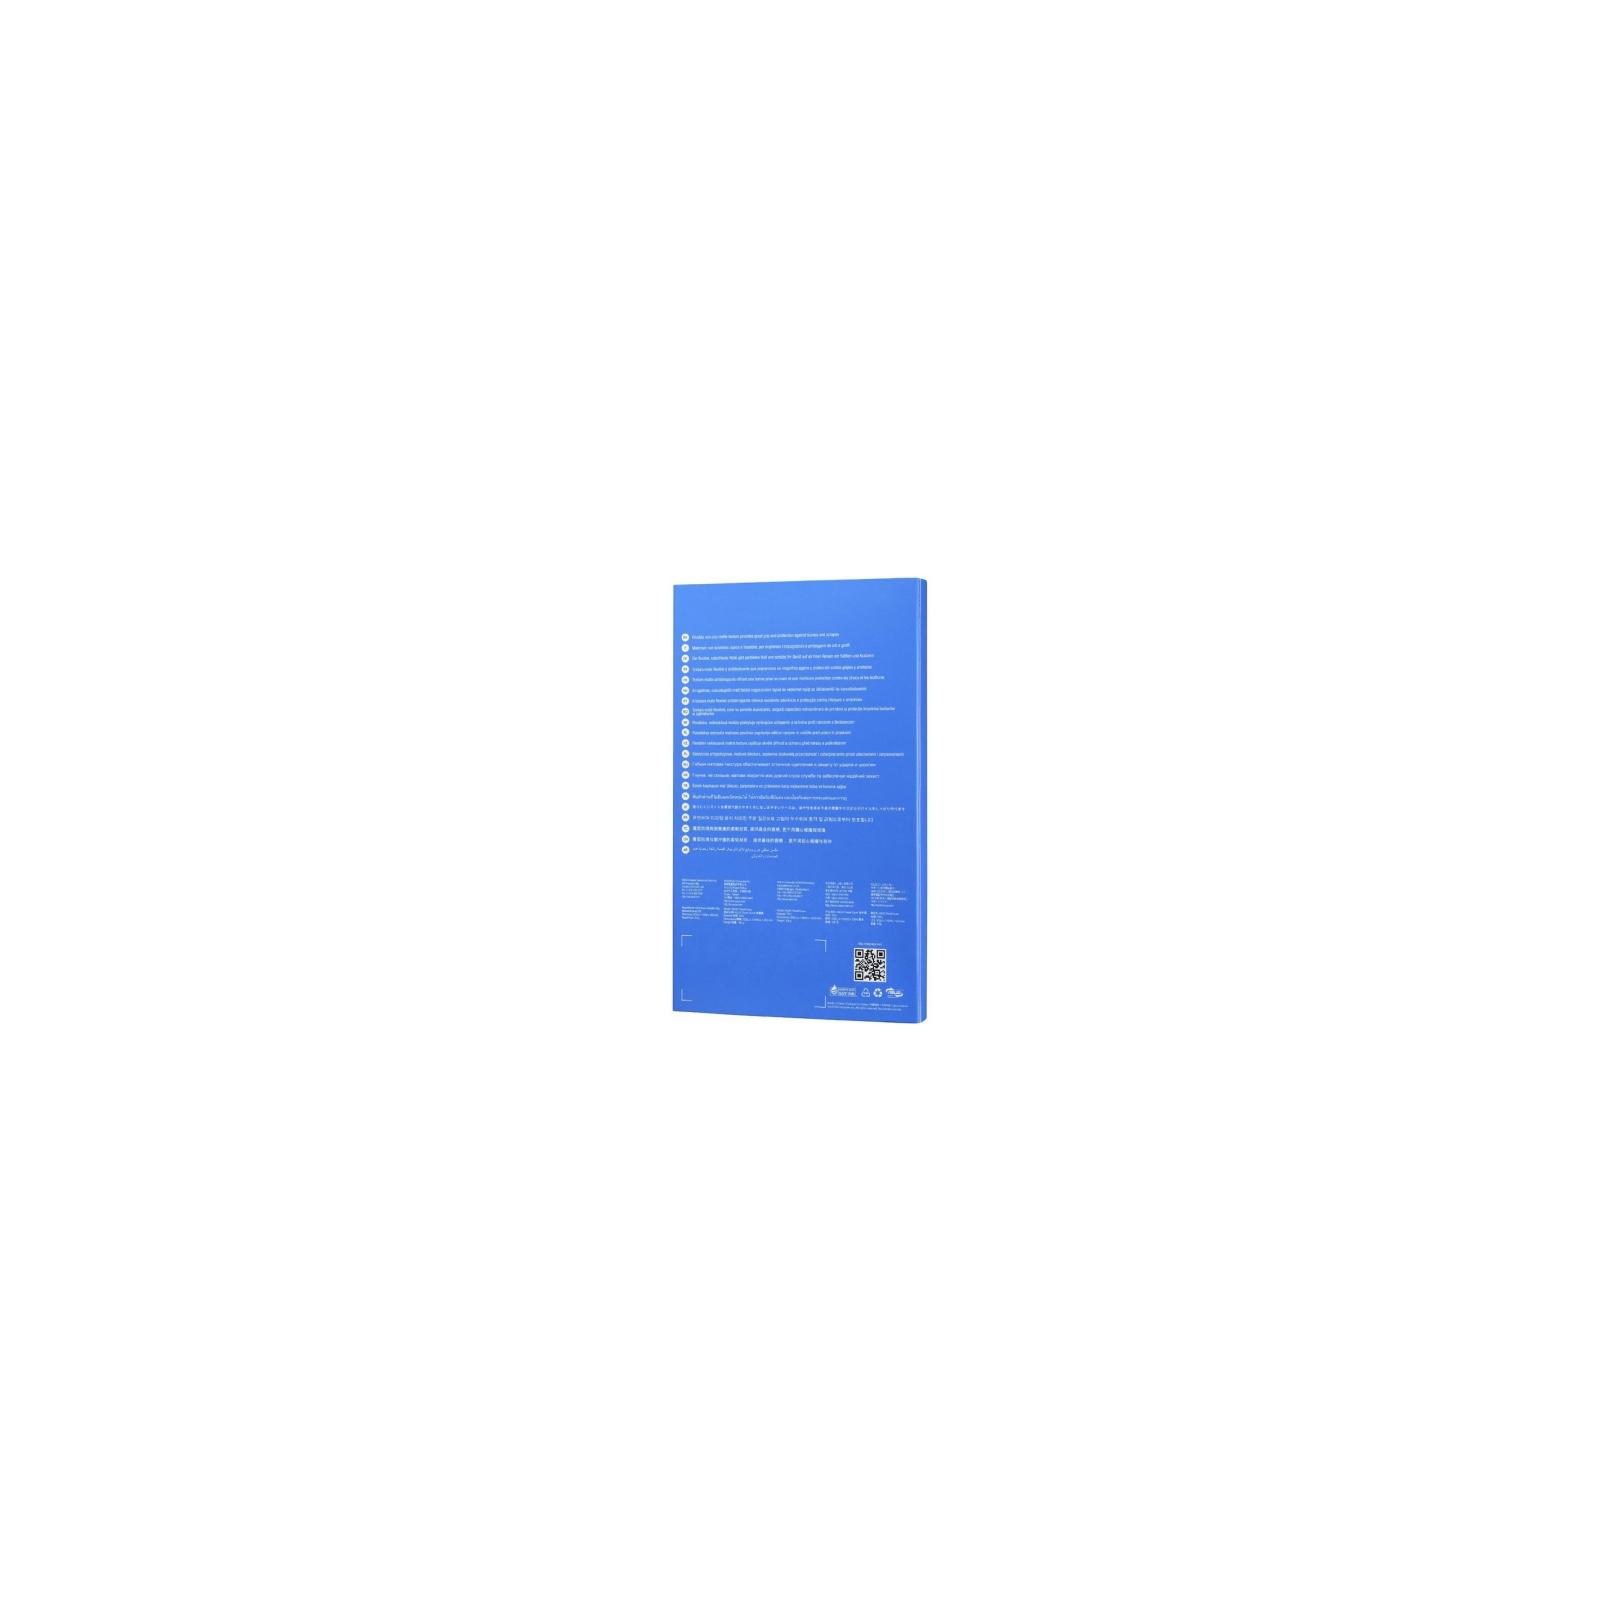 Чехол для планшета ASUS Nexus 7 2013 TRAVEL COVER V2 PINK (90-XB3TOKSL001P0-) изображение 8